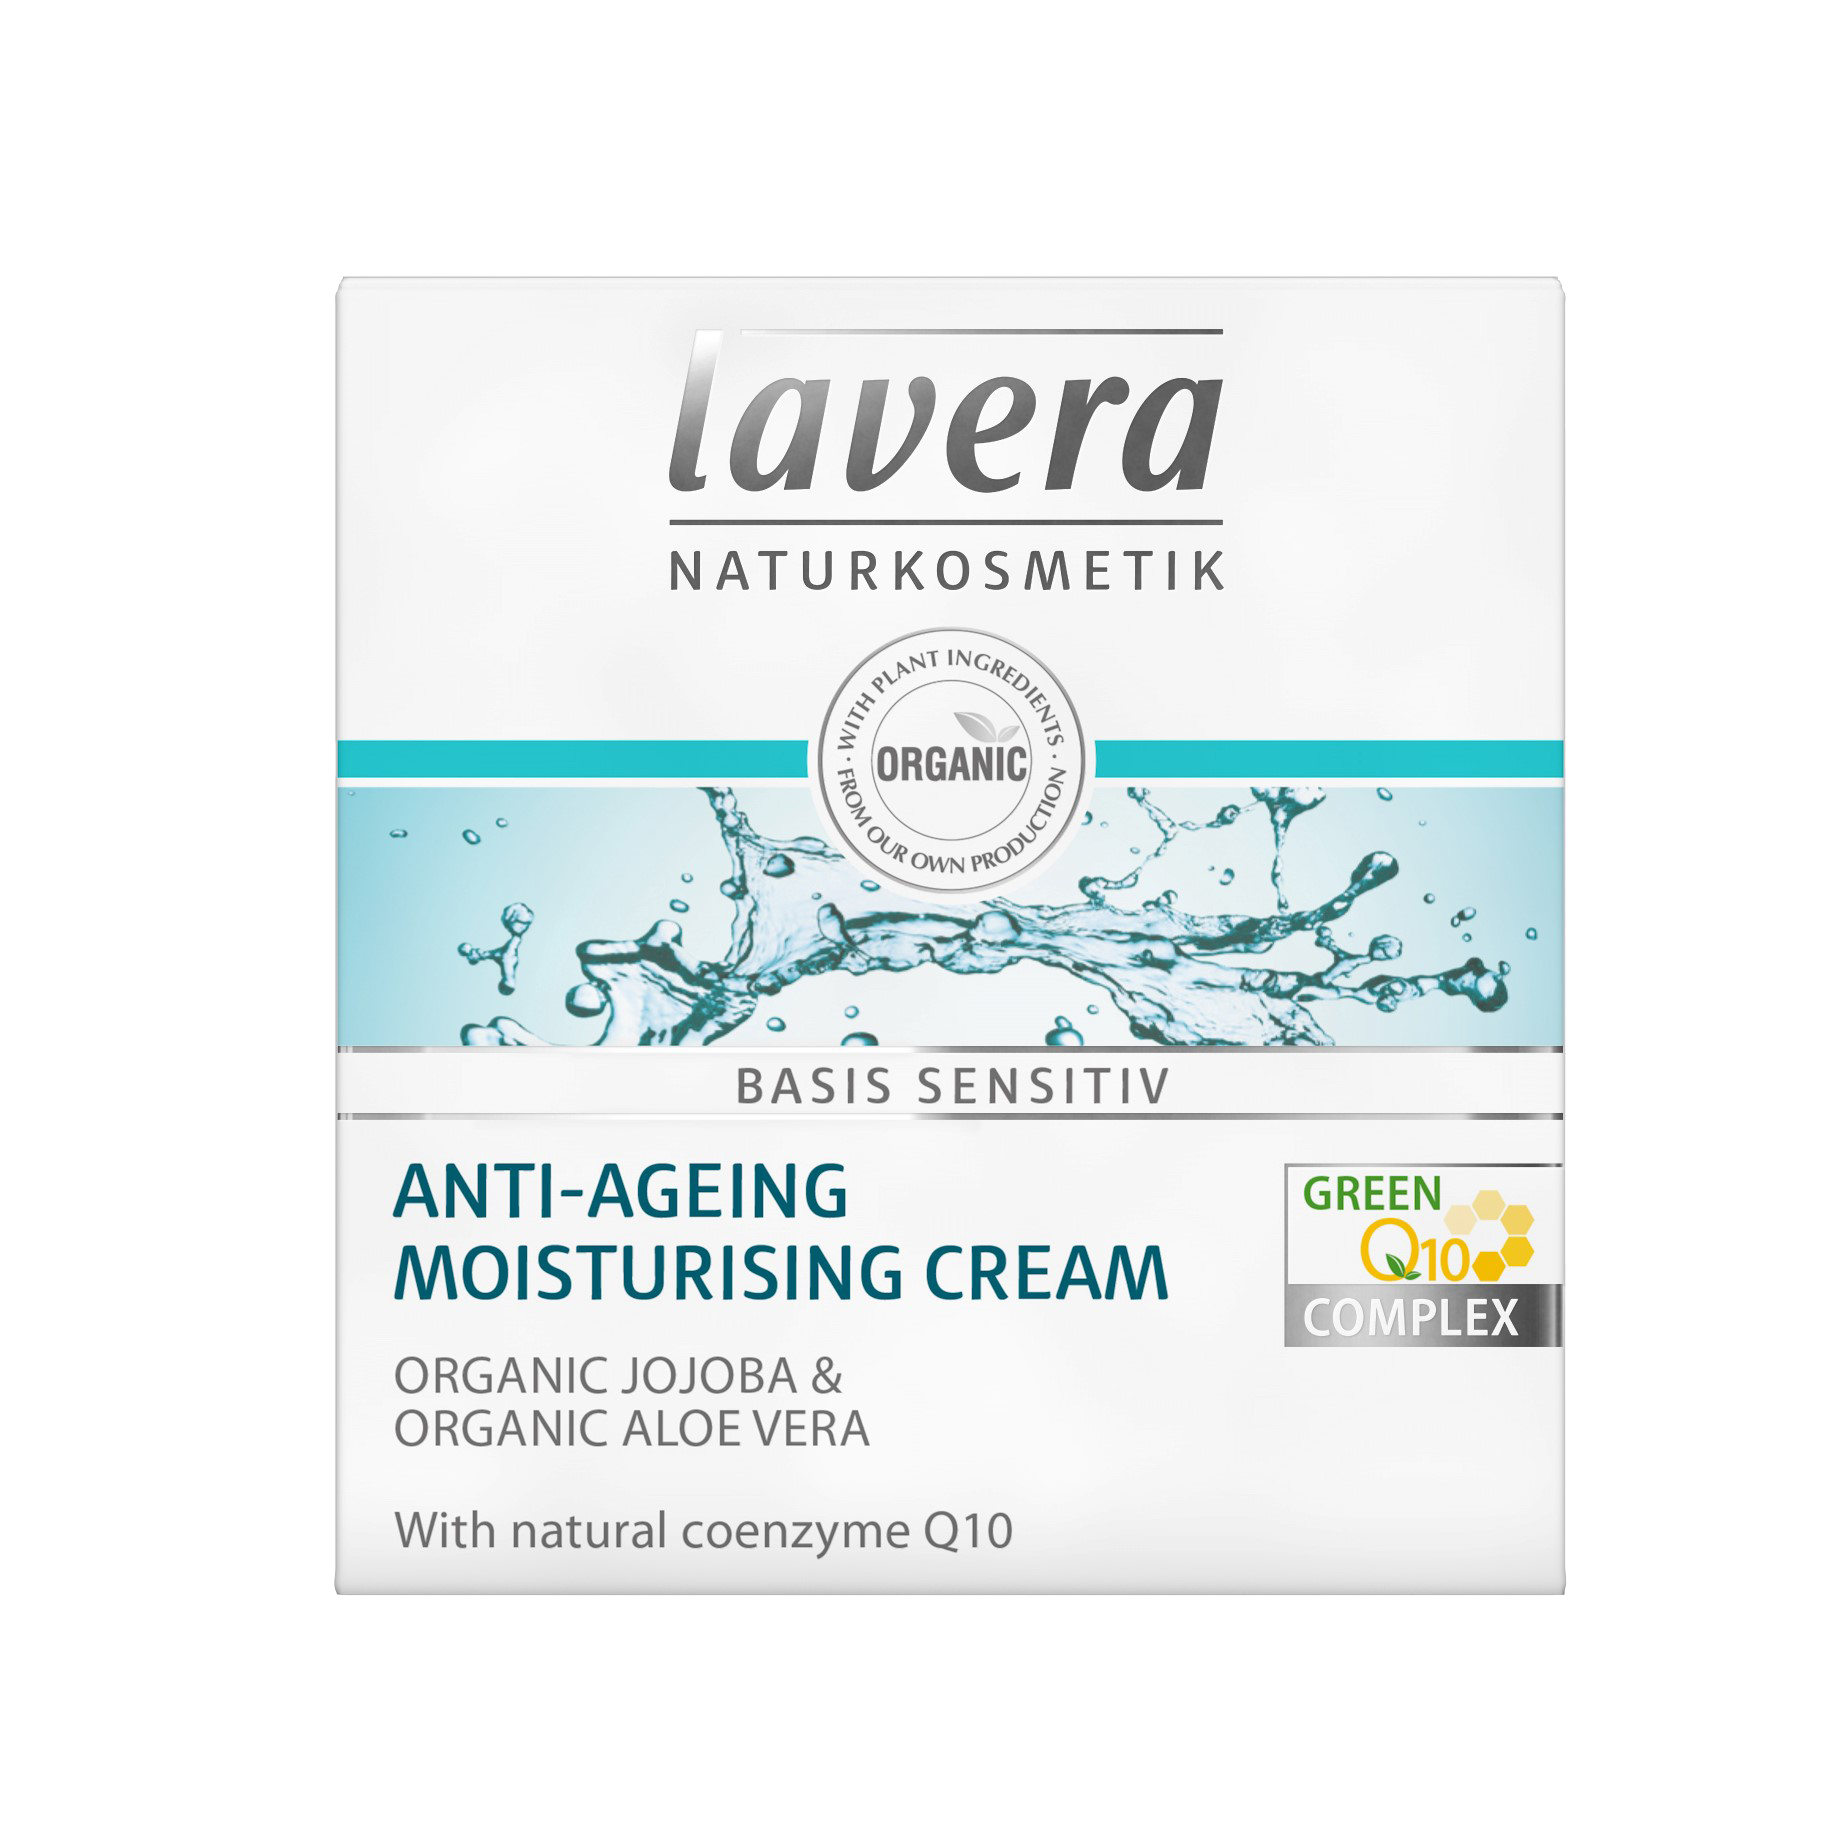 Lavera Basis Anti-Ageing Q10 Moisturising Cream 50ml